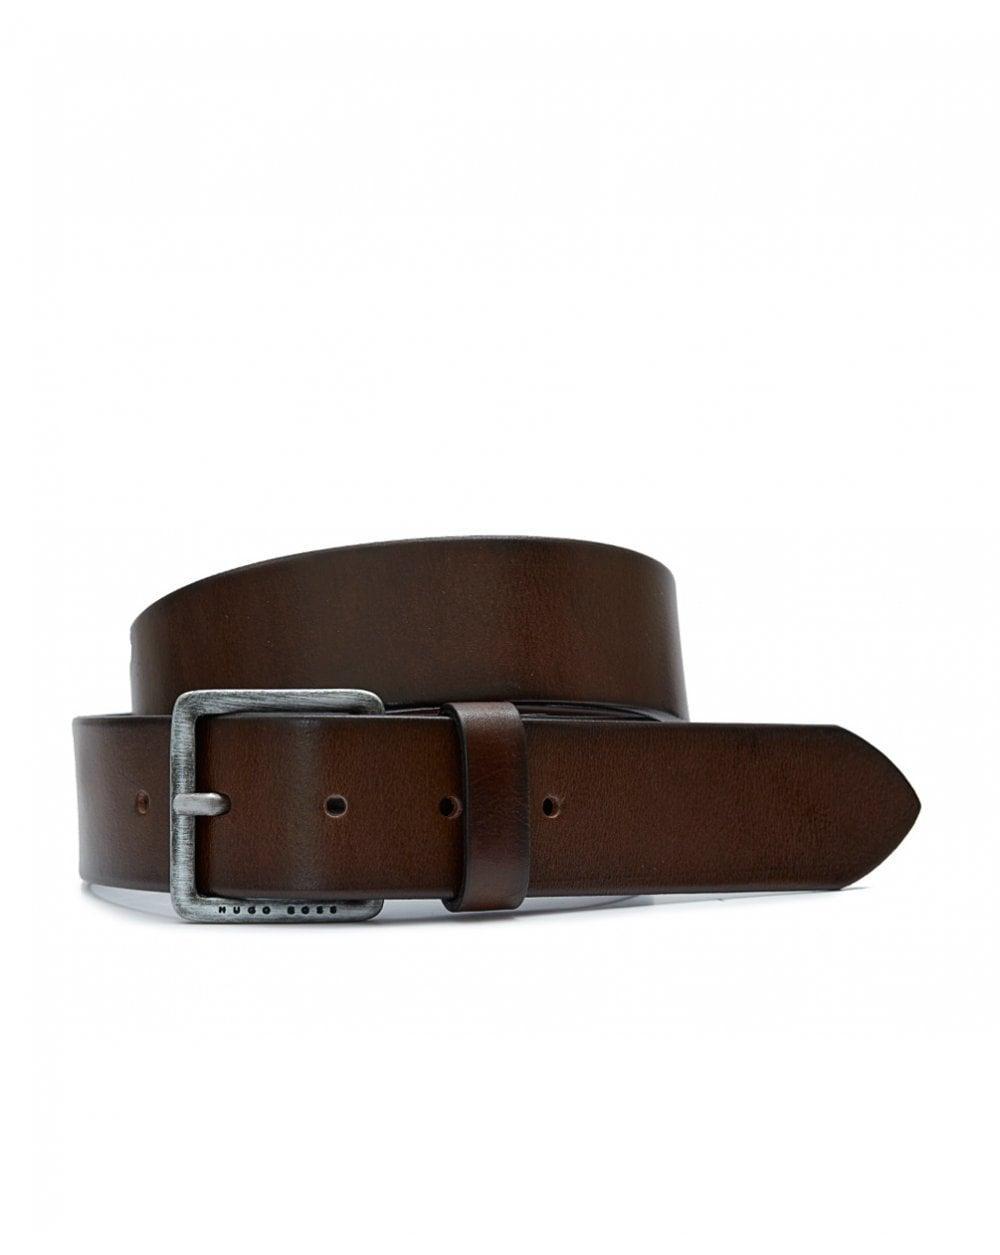 35aee901431d Lyst - BOSS Casual Accessories Jeeko Leather Belt in Brown for Men